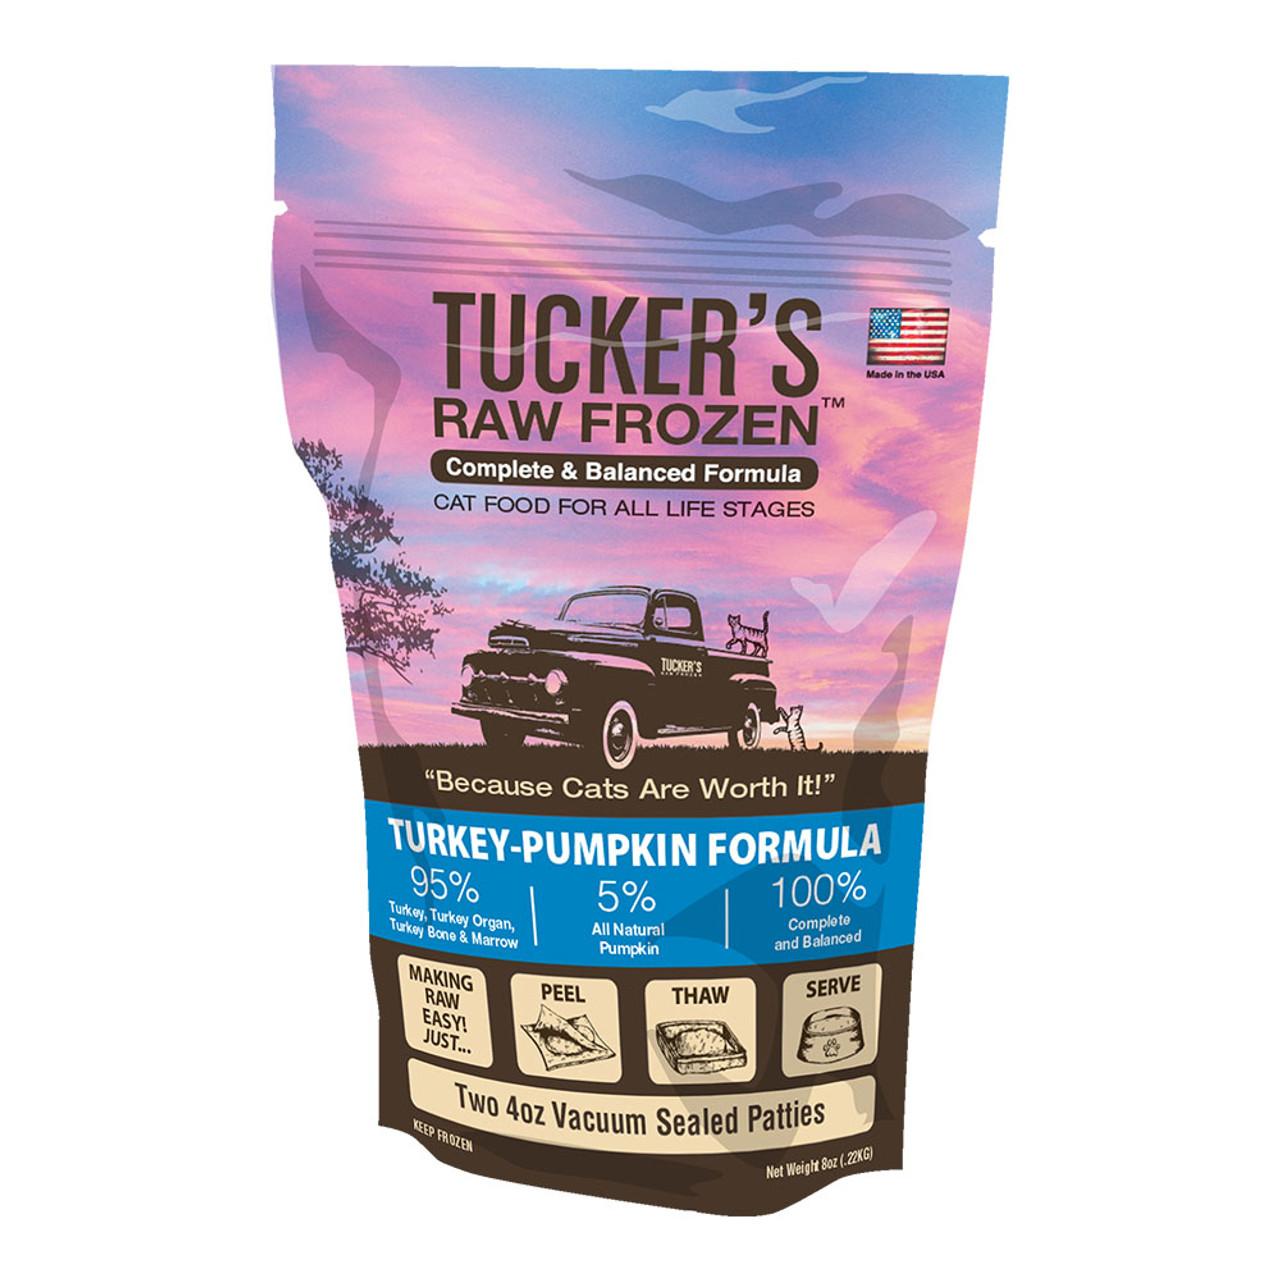 Tucker's Raw Frozen Turkey-Pumpkin Diet Cat Food